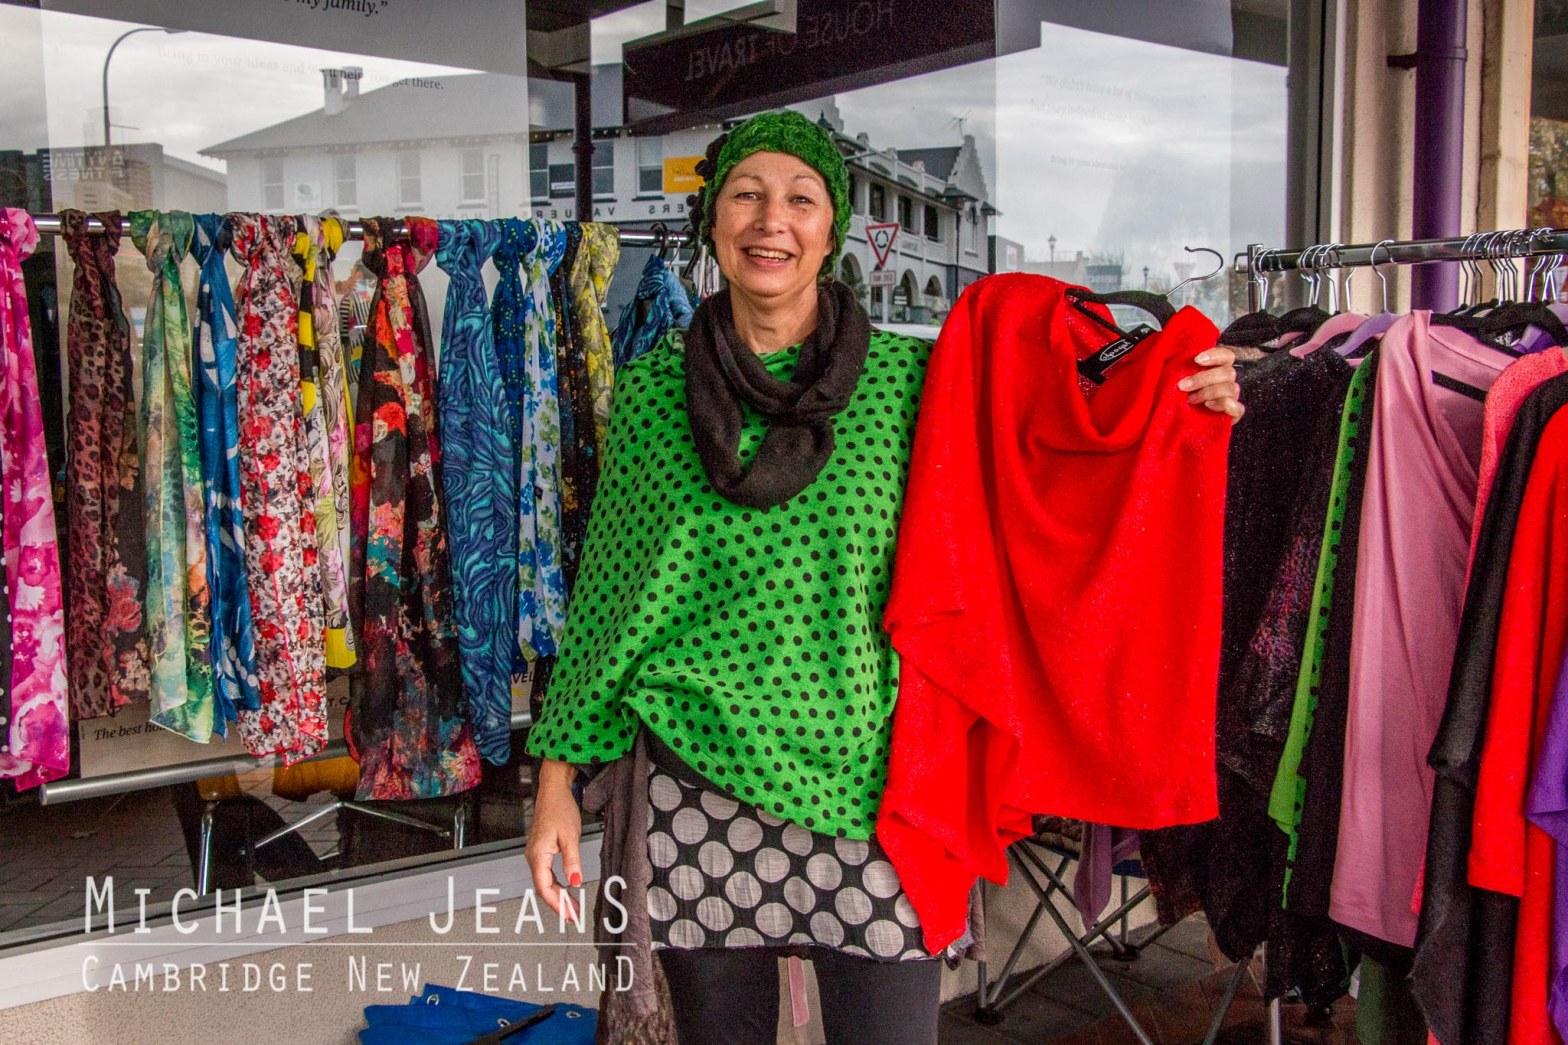 Amy Skye at Lions Trash n Treasure Market Cambridge New Zealand